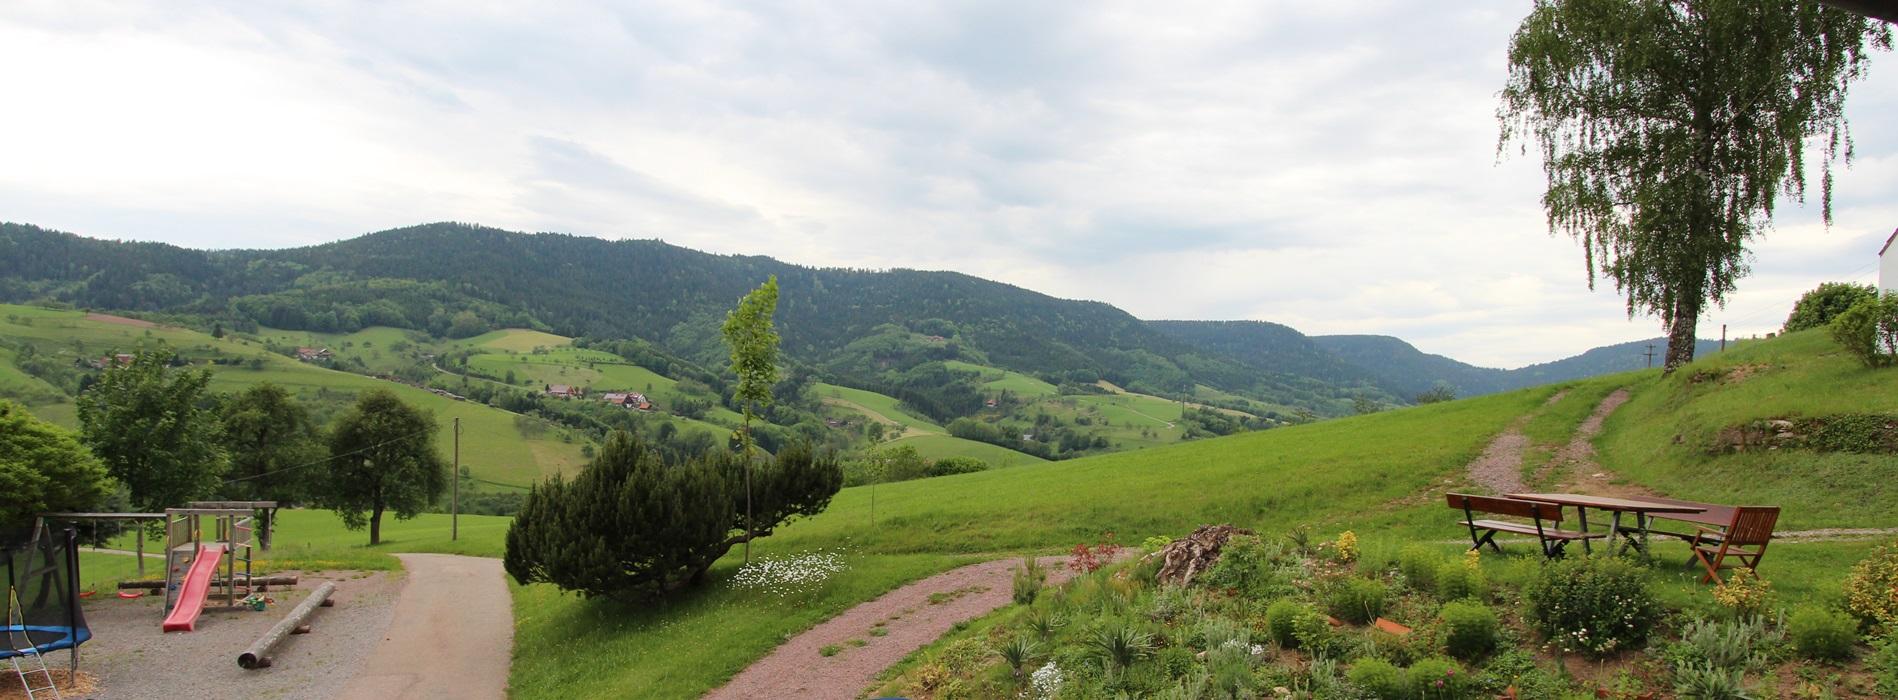 Anreise Hubhof Oberharmesbach